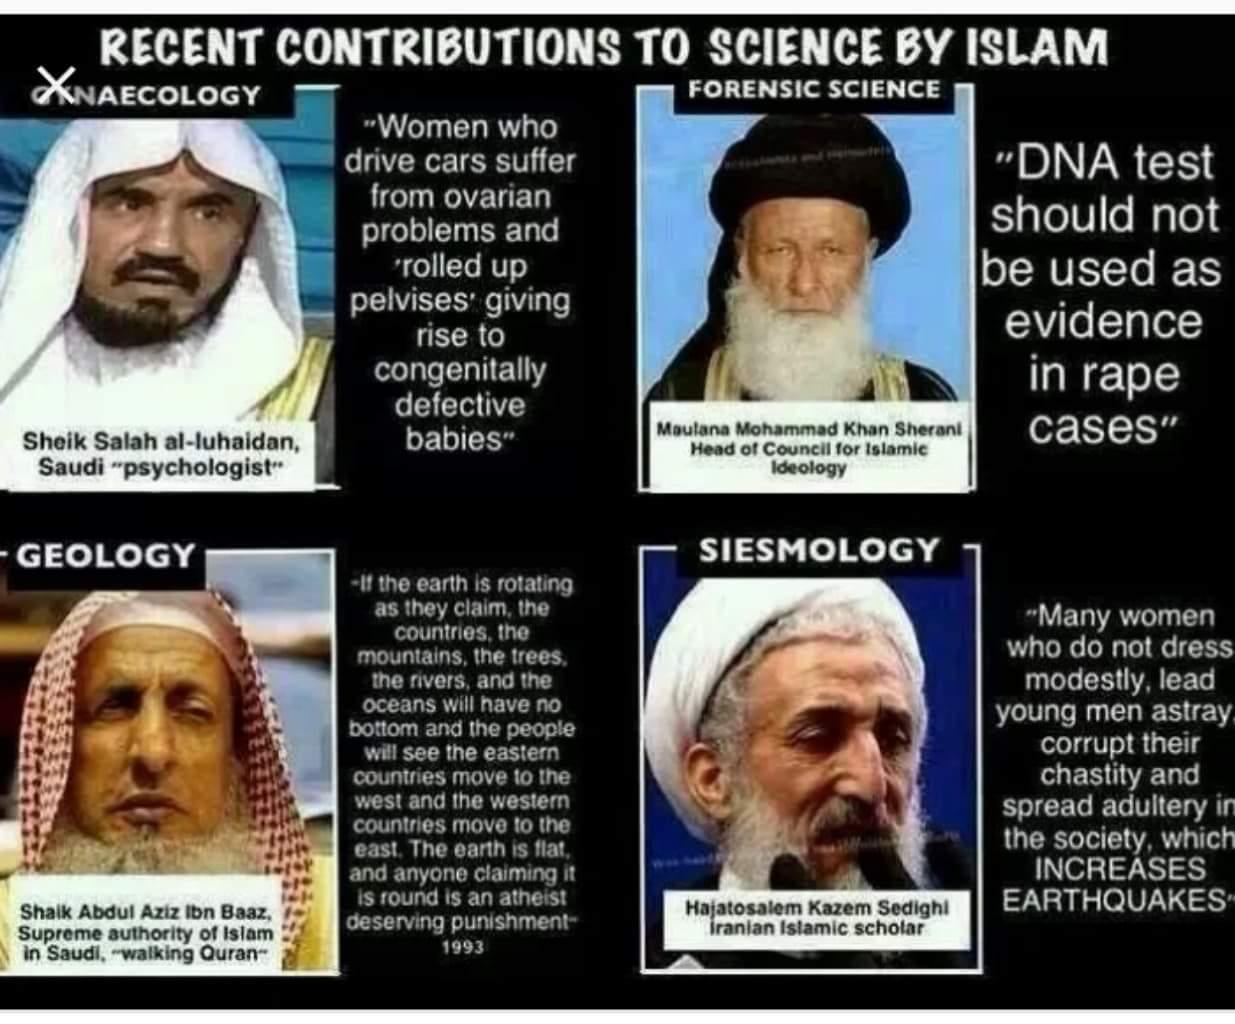 flat earth hadith scientific error science quran Sheikh Abdul-Aziz Ibn Baaz Saudi Arabia atheist punishment islamic science Salah Al-luhaidan psychology psychologist ideology DNA rape Iranian earthquakes seismology